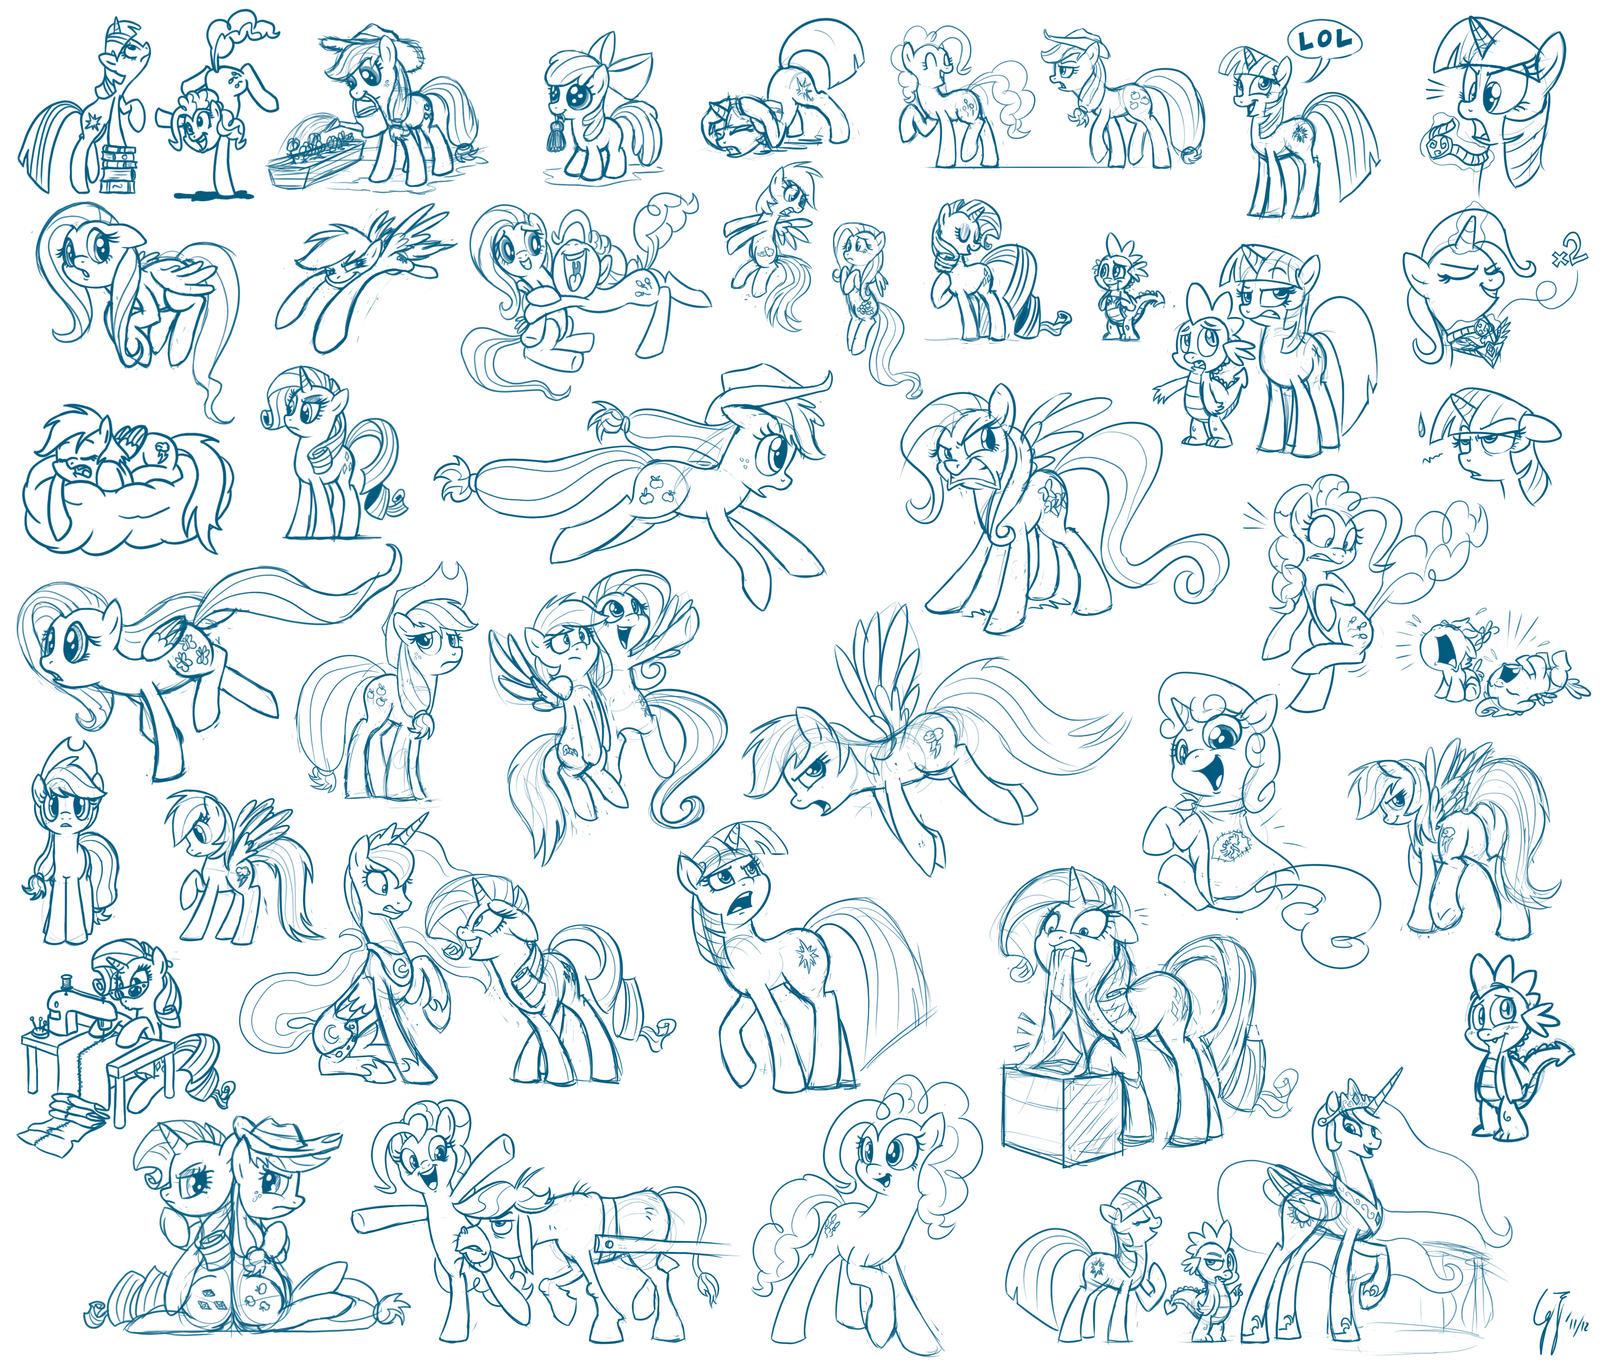 Just Drawing Ponies by GlancoJusticar